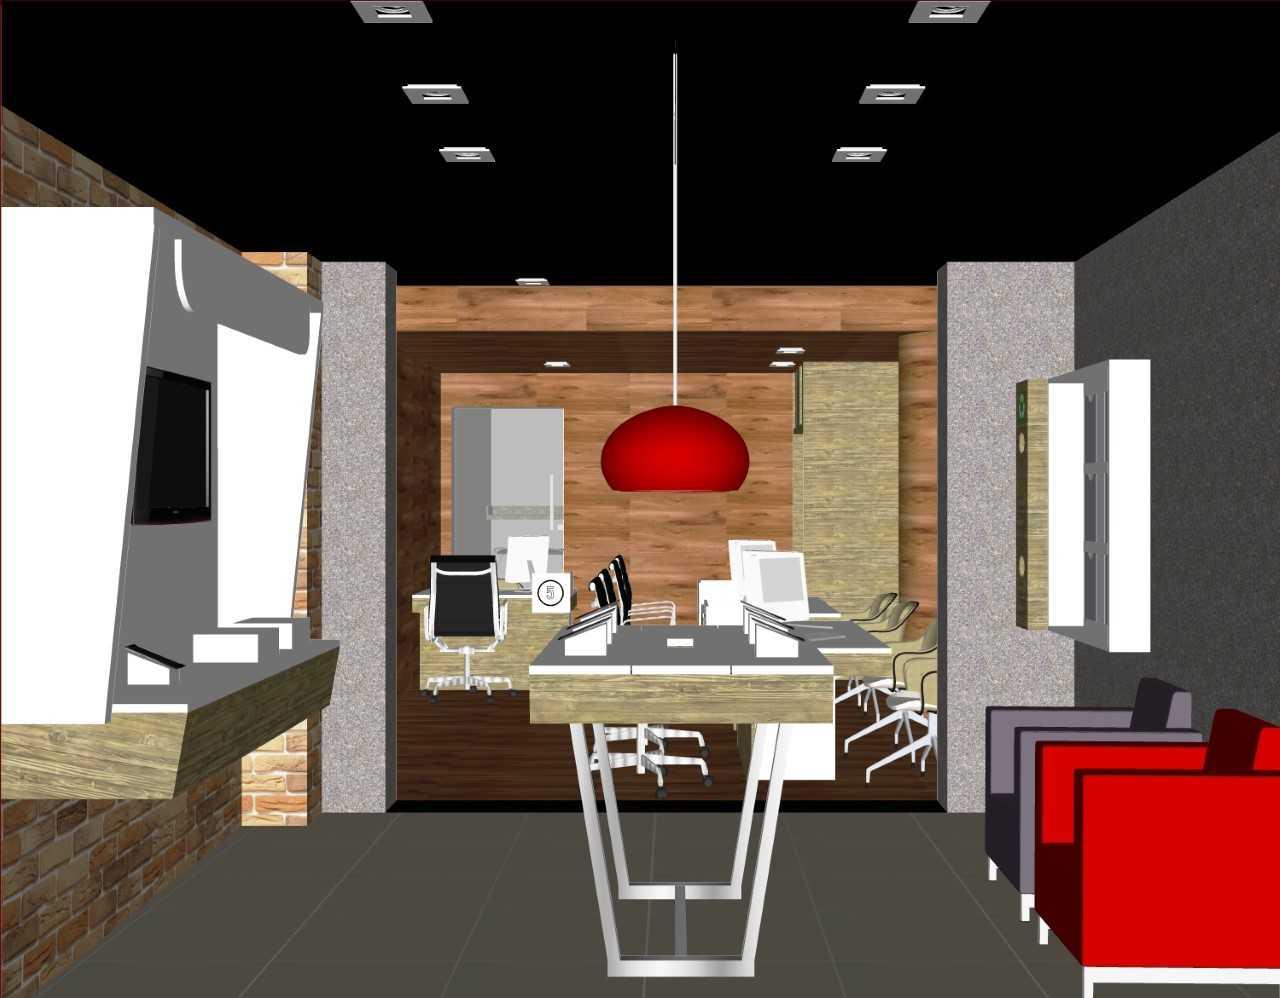 Design de Interiores integrado ao Ensino Médio